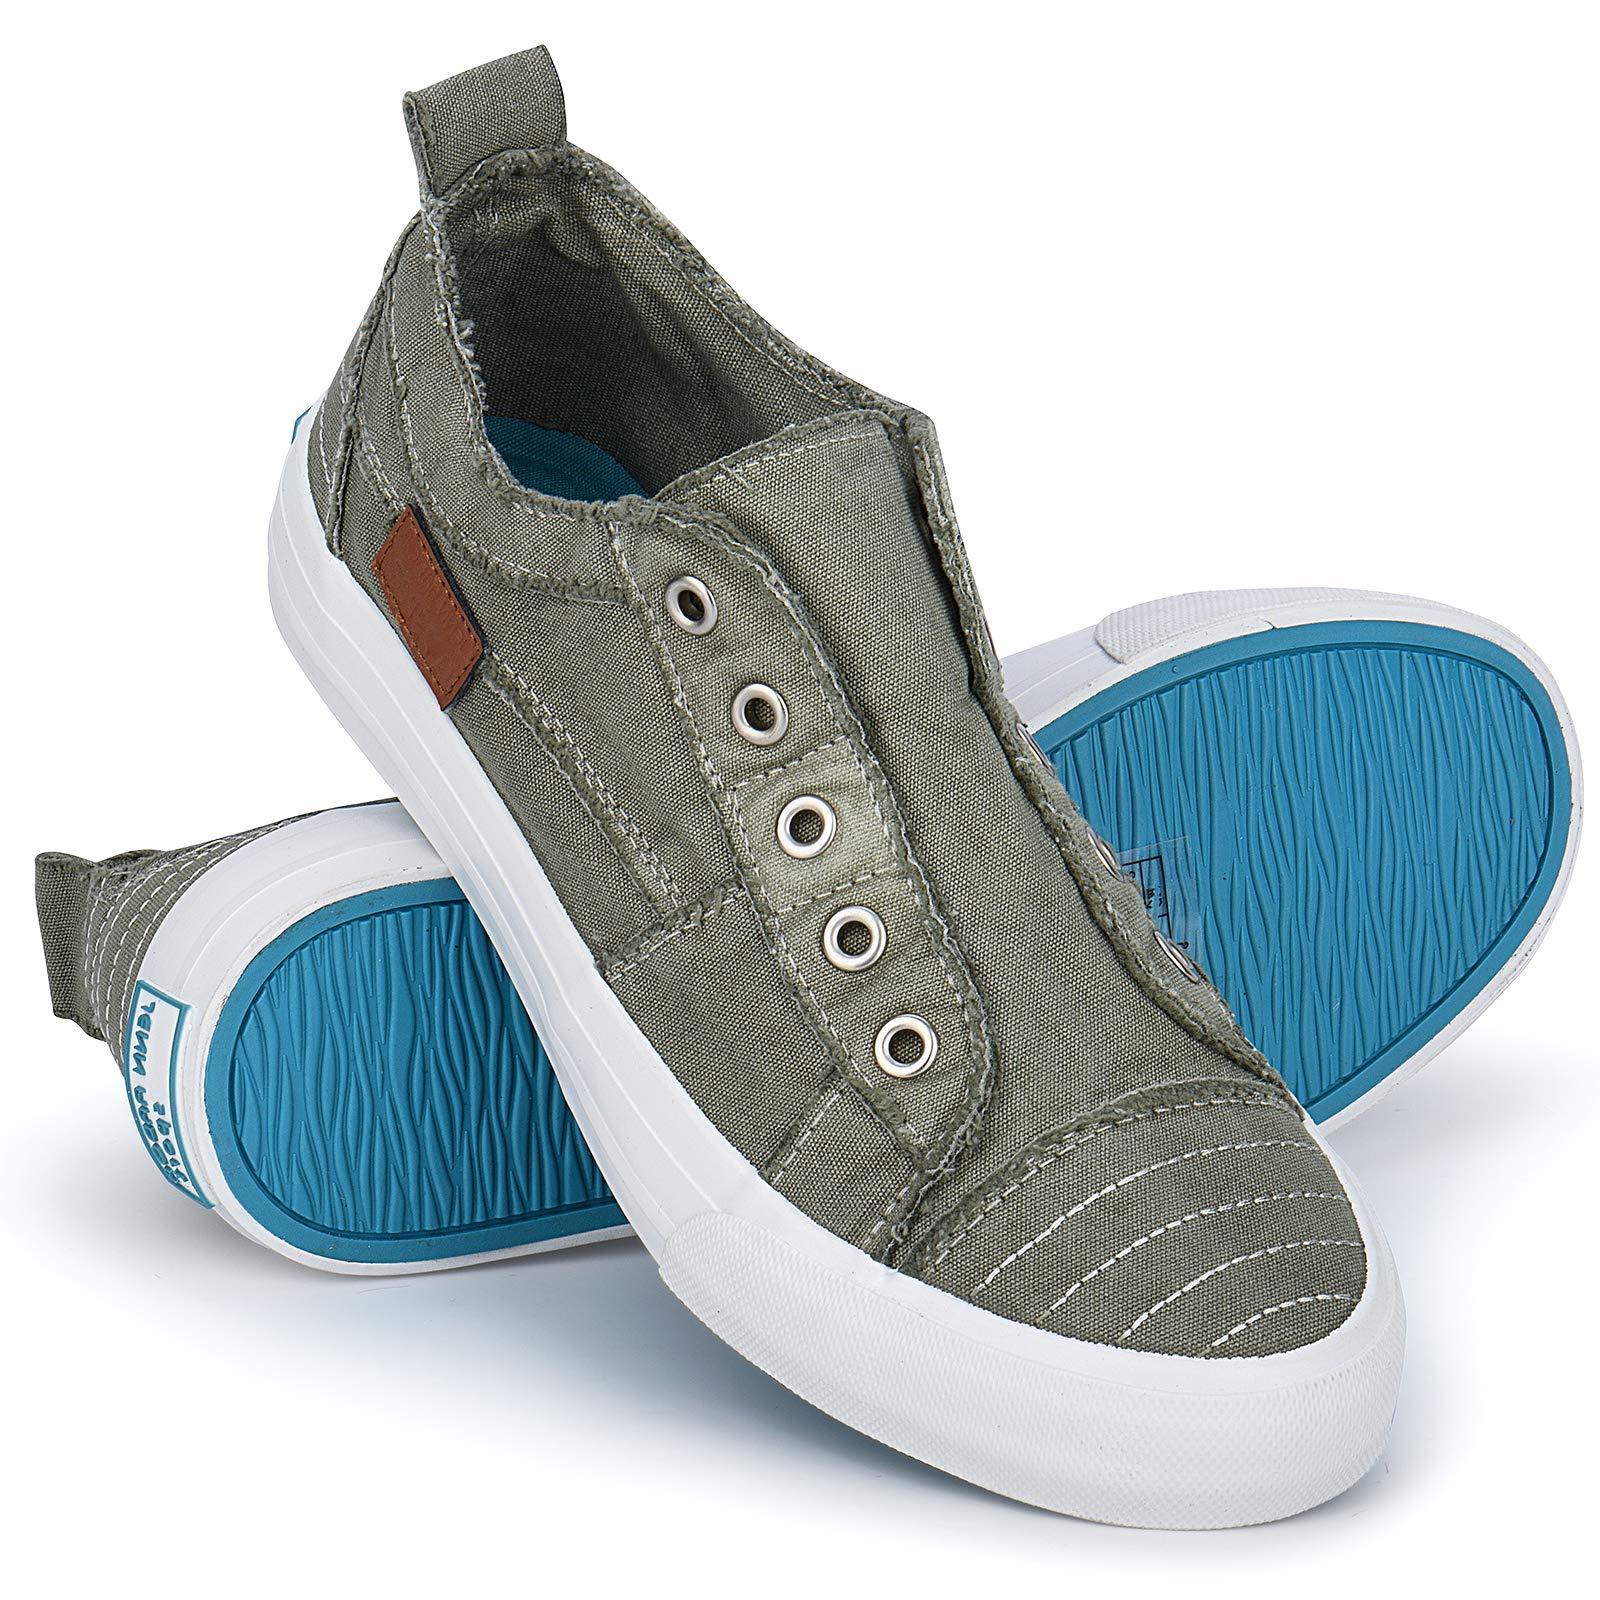 JENN ARDOR Womens Canvas Sneaker Shoes Fashion Slip on Low Tops Shoes